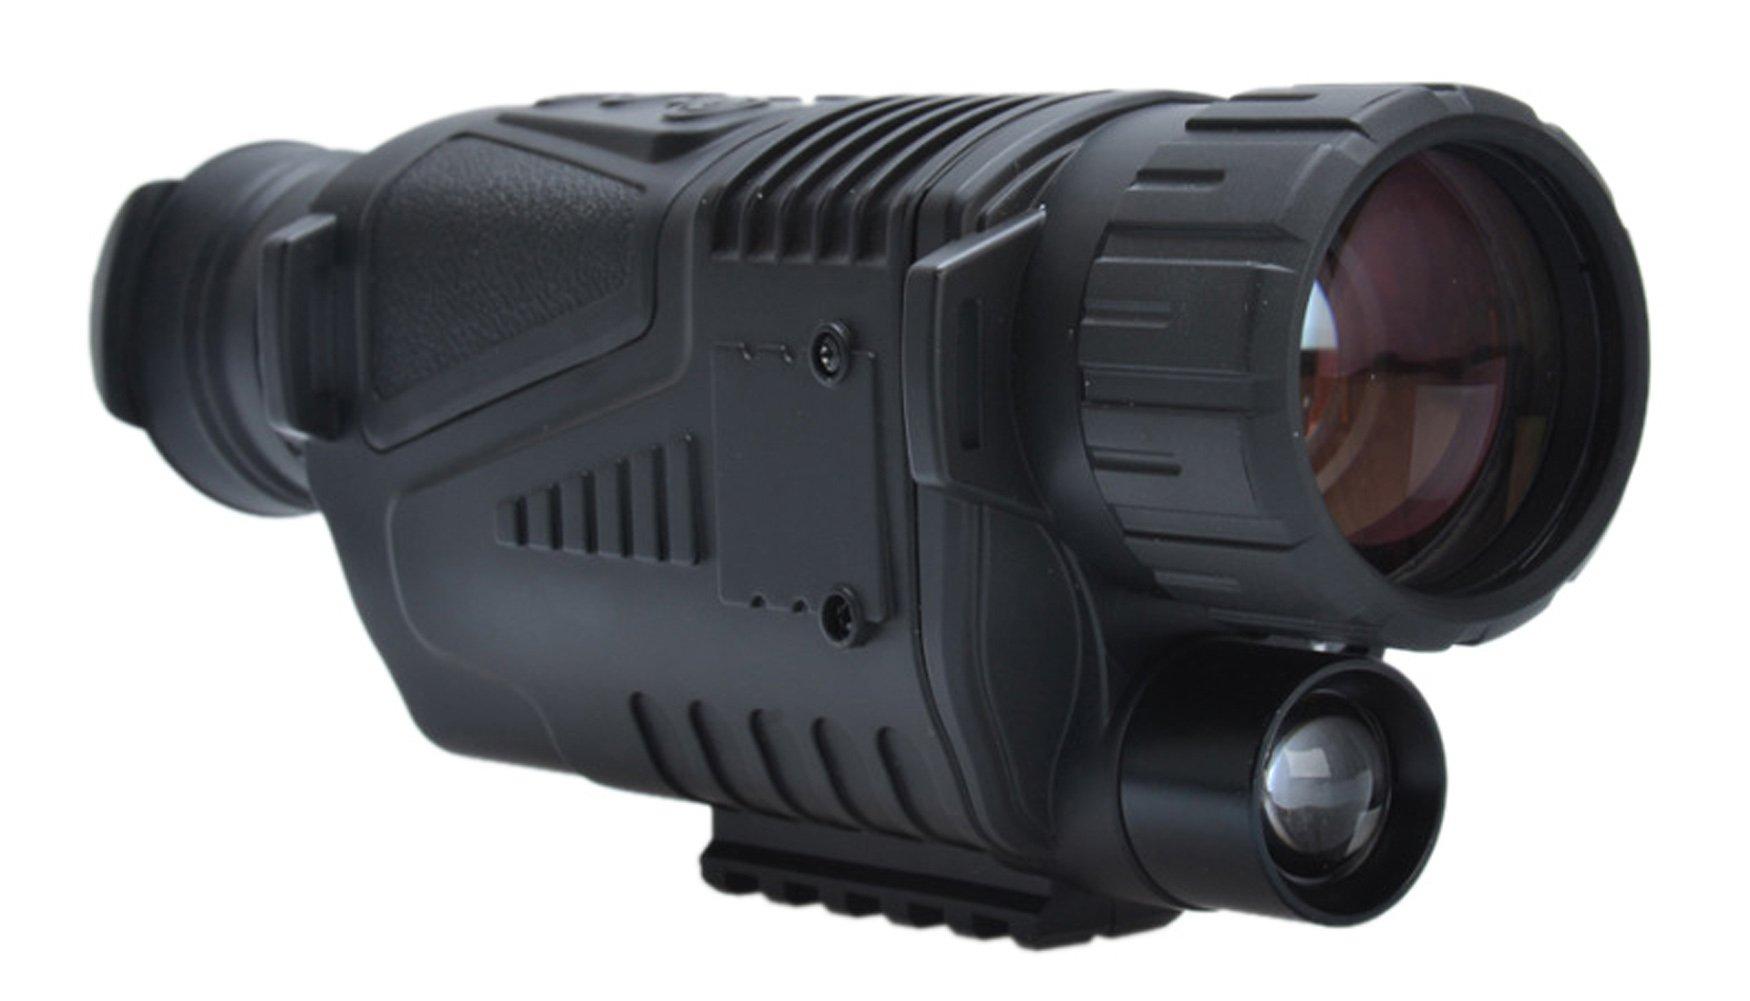 Insun Day and Night Vision Digital Camera Binoculars Infrared Spy 5x 40mm